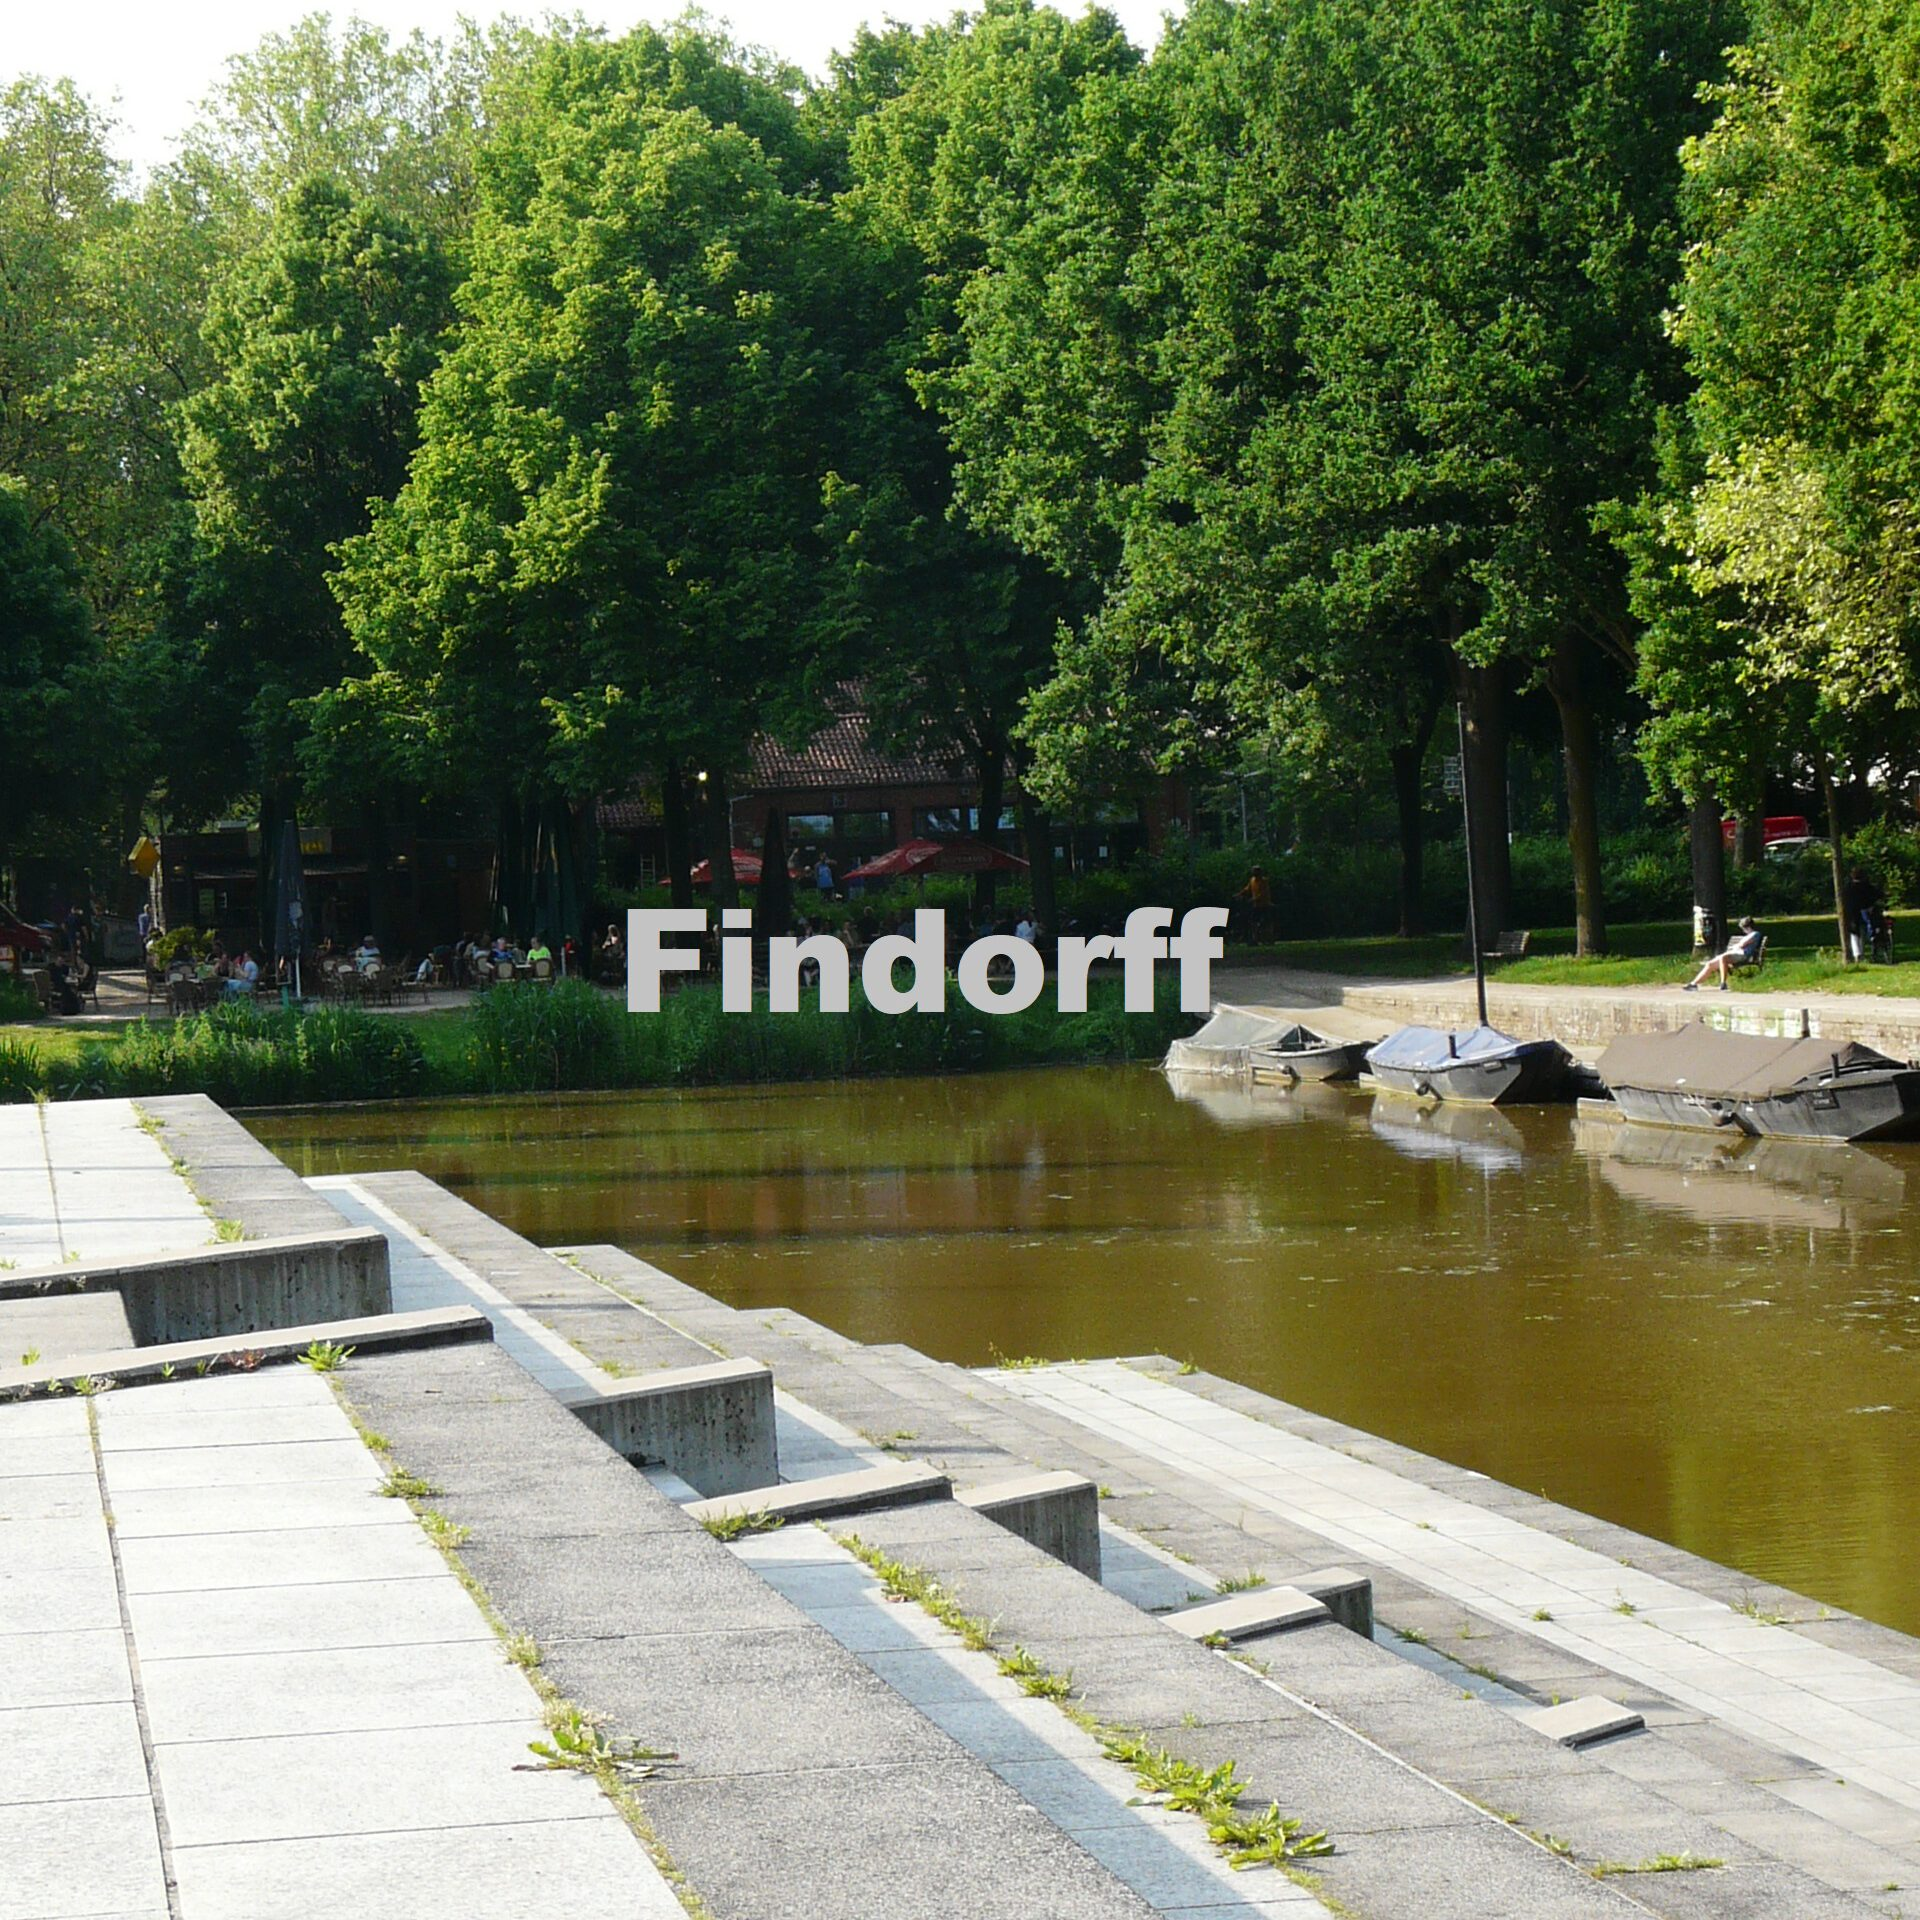 Findorff Arial